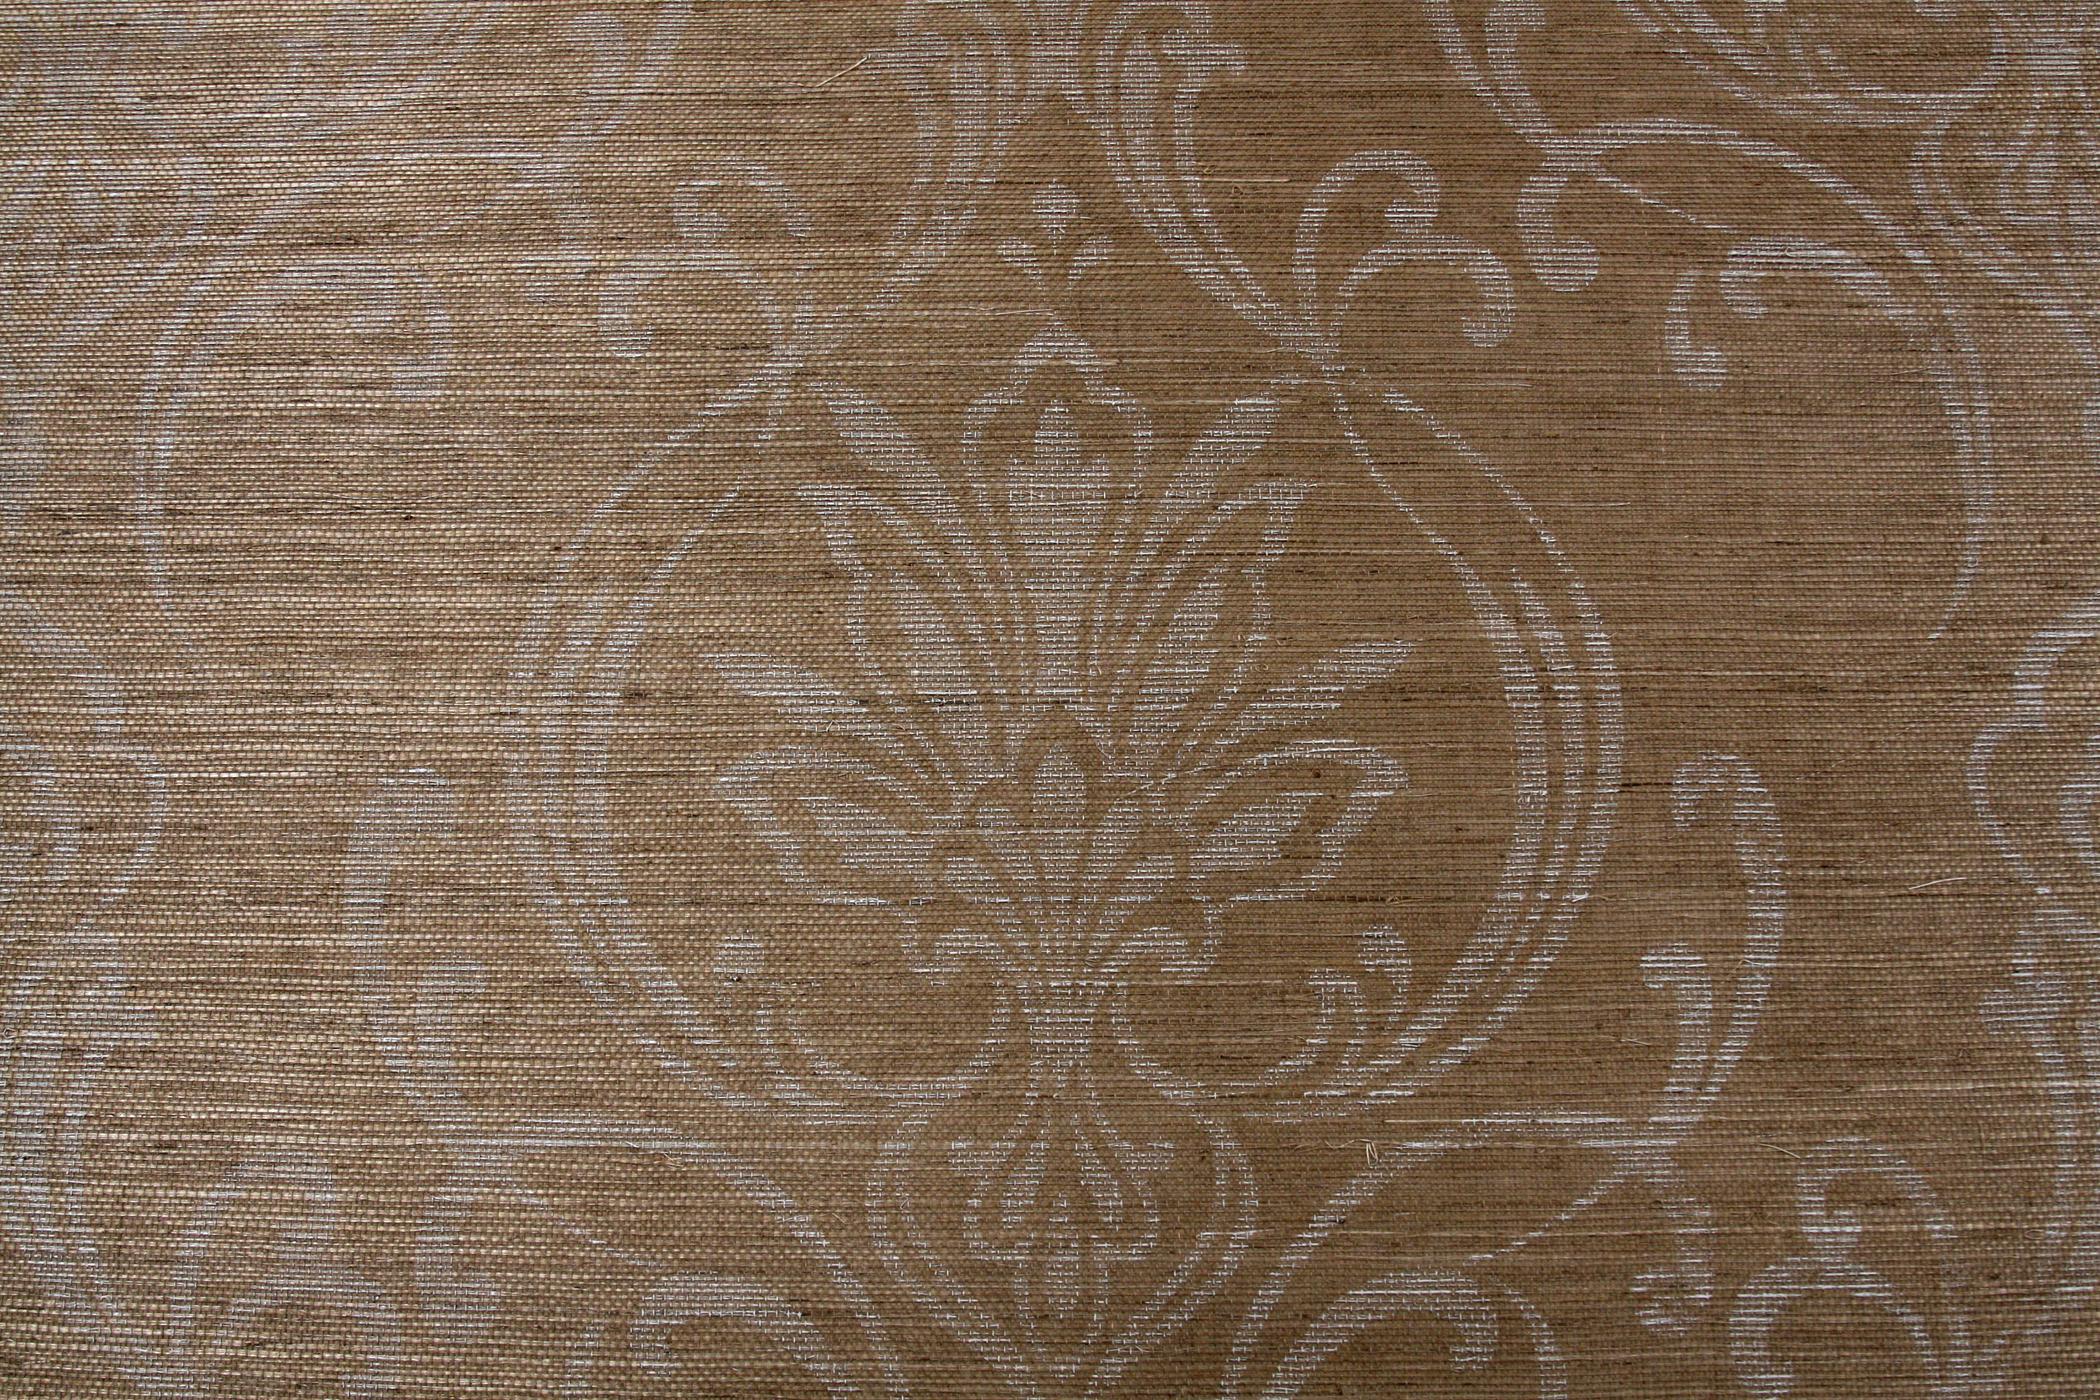 York Wallcoverings Candice Olsons Filagree on Sisal York 2100x1400